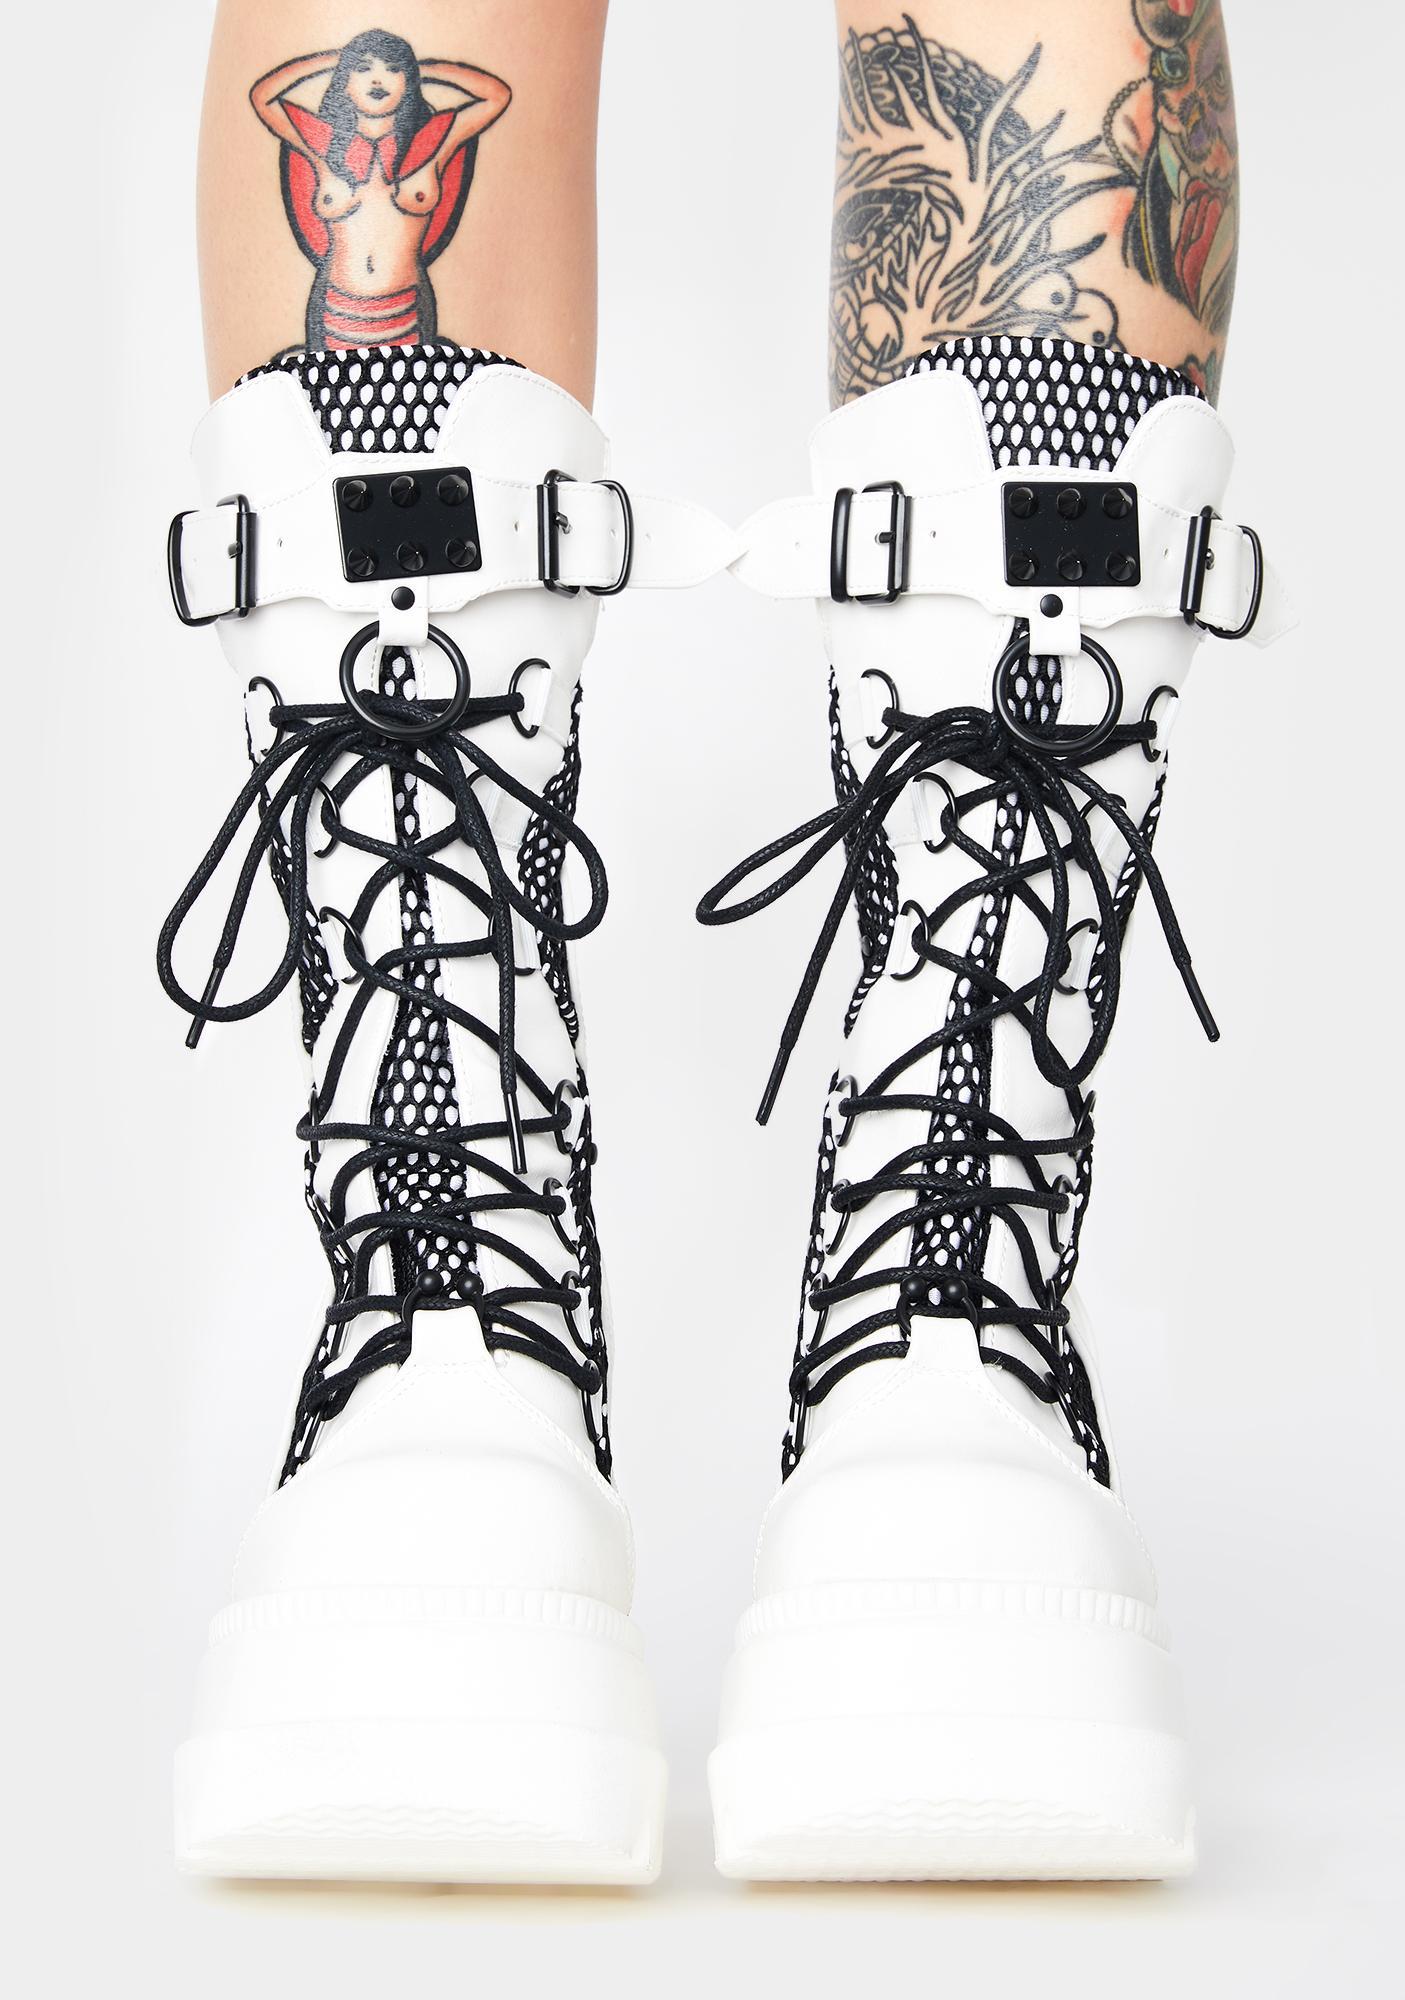 Demonia White High Rise Shaker Boots